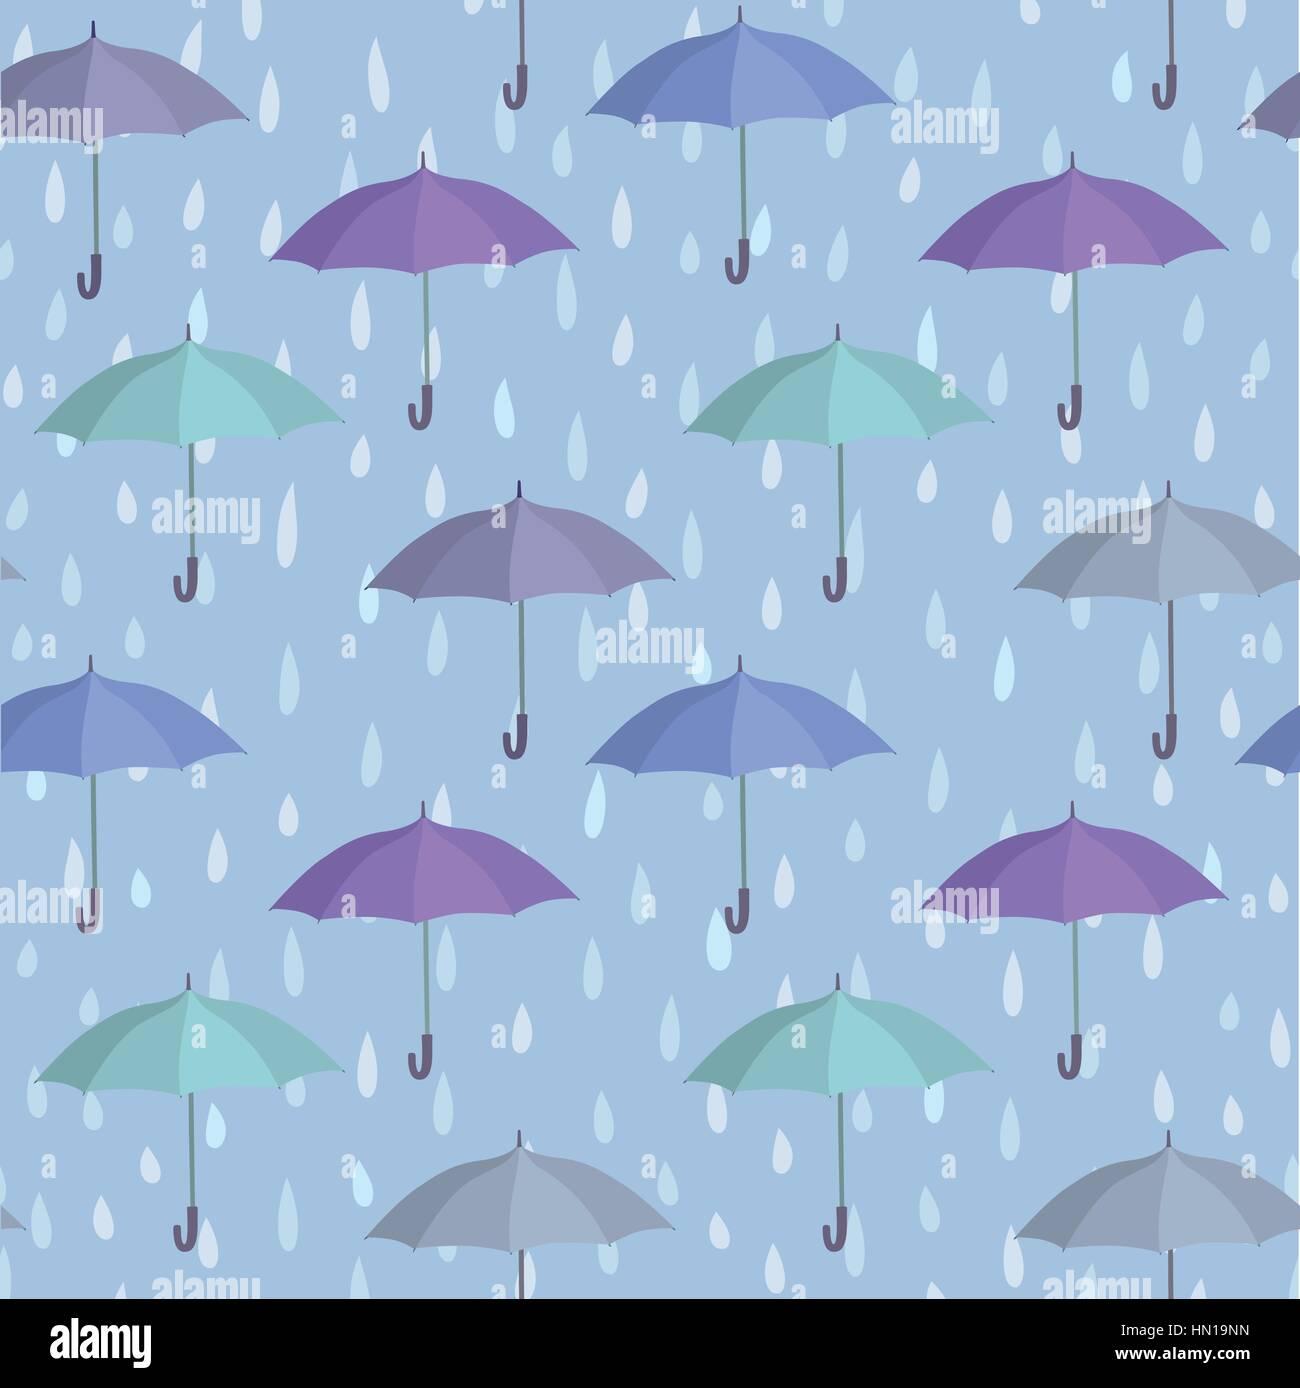 Umbrella Over Raindrop Background Rainstorm Seamless Pattern Rainy Weather Ornament Water Drops Tiled Wallpaper